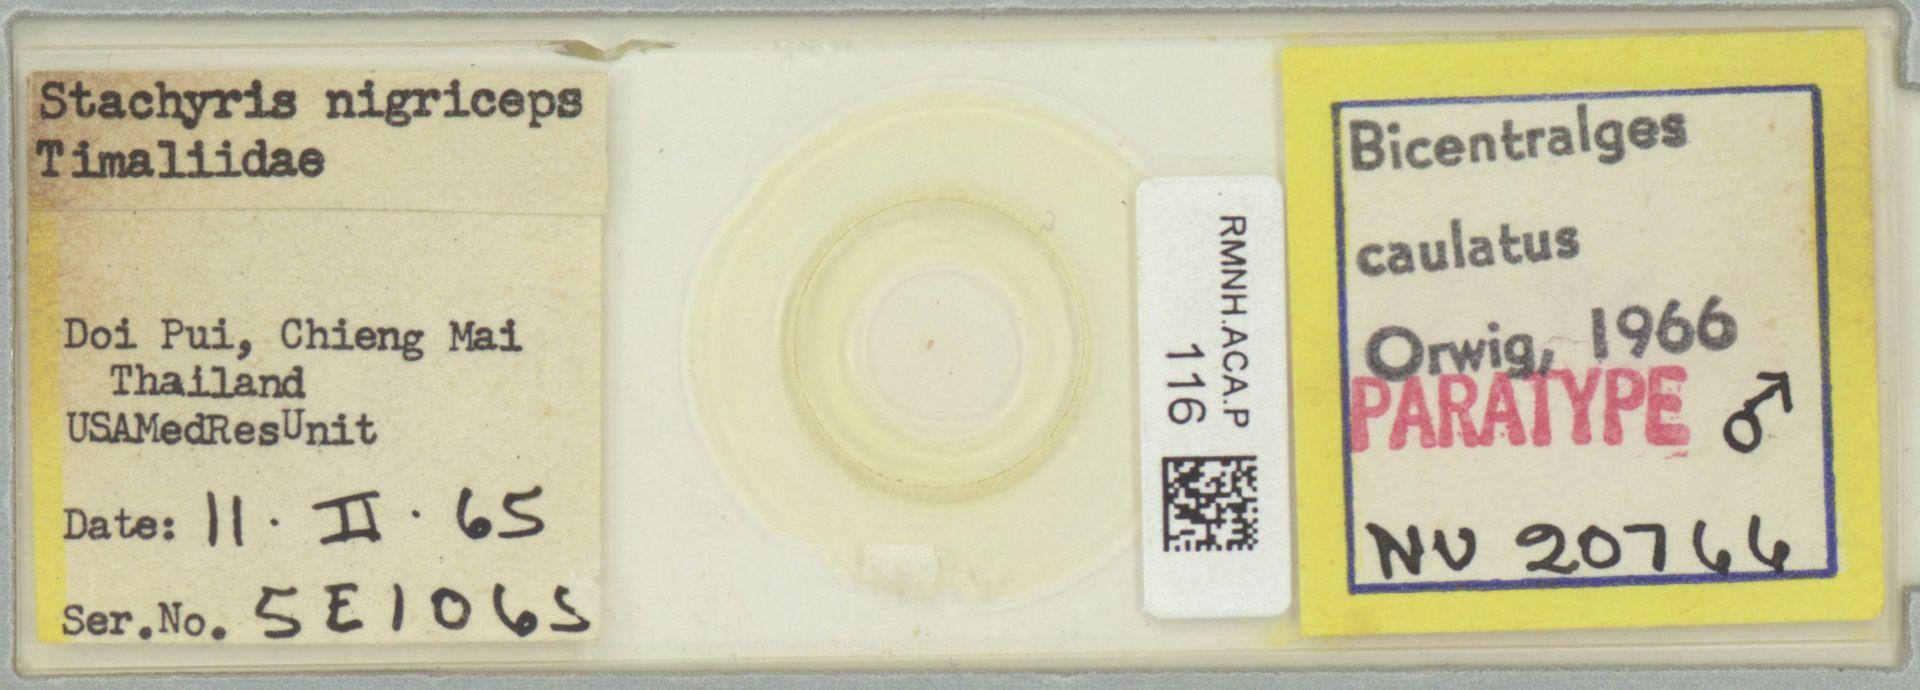 RMNH.ACA.P.116 | Bicentralges caulatus Orwig, 1966